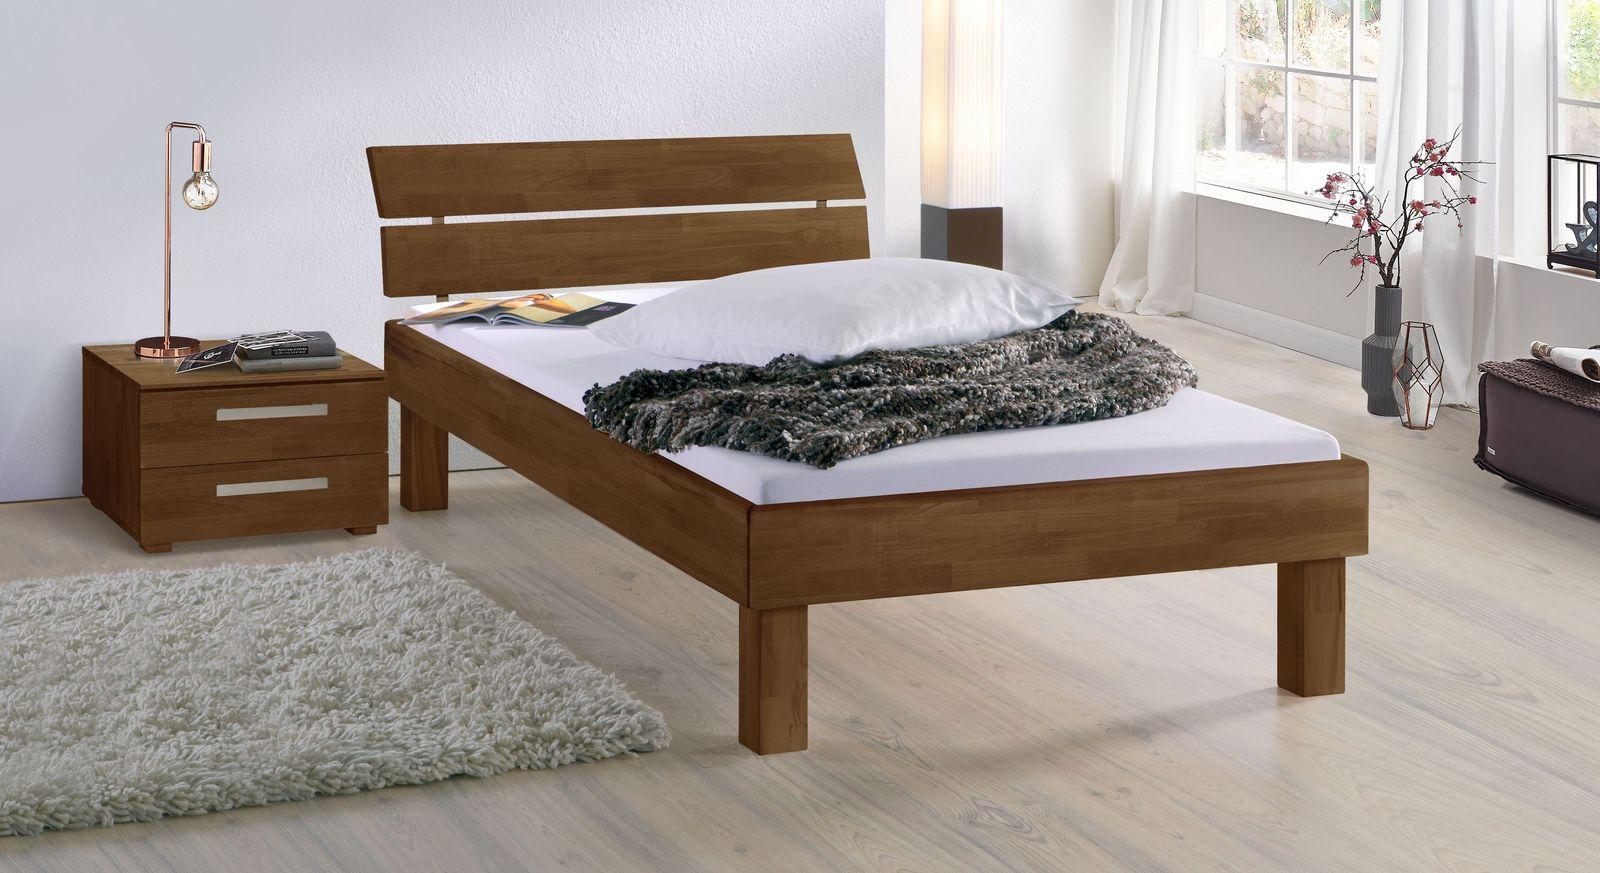 Nussbaumfarbenes Bett Madrid Komfort in 25 cm Höhe